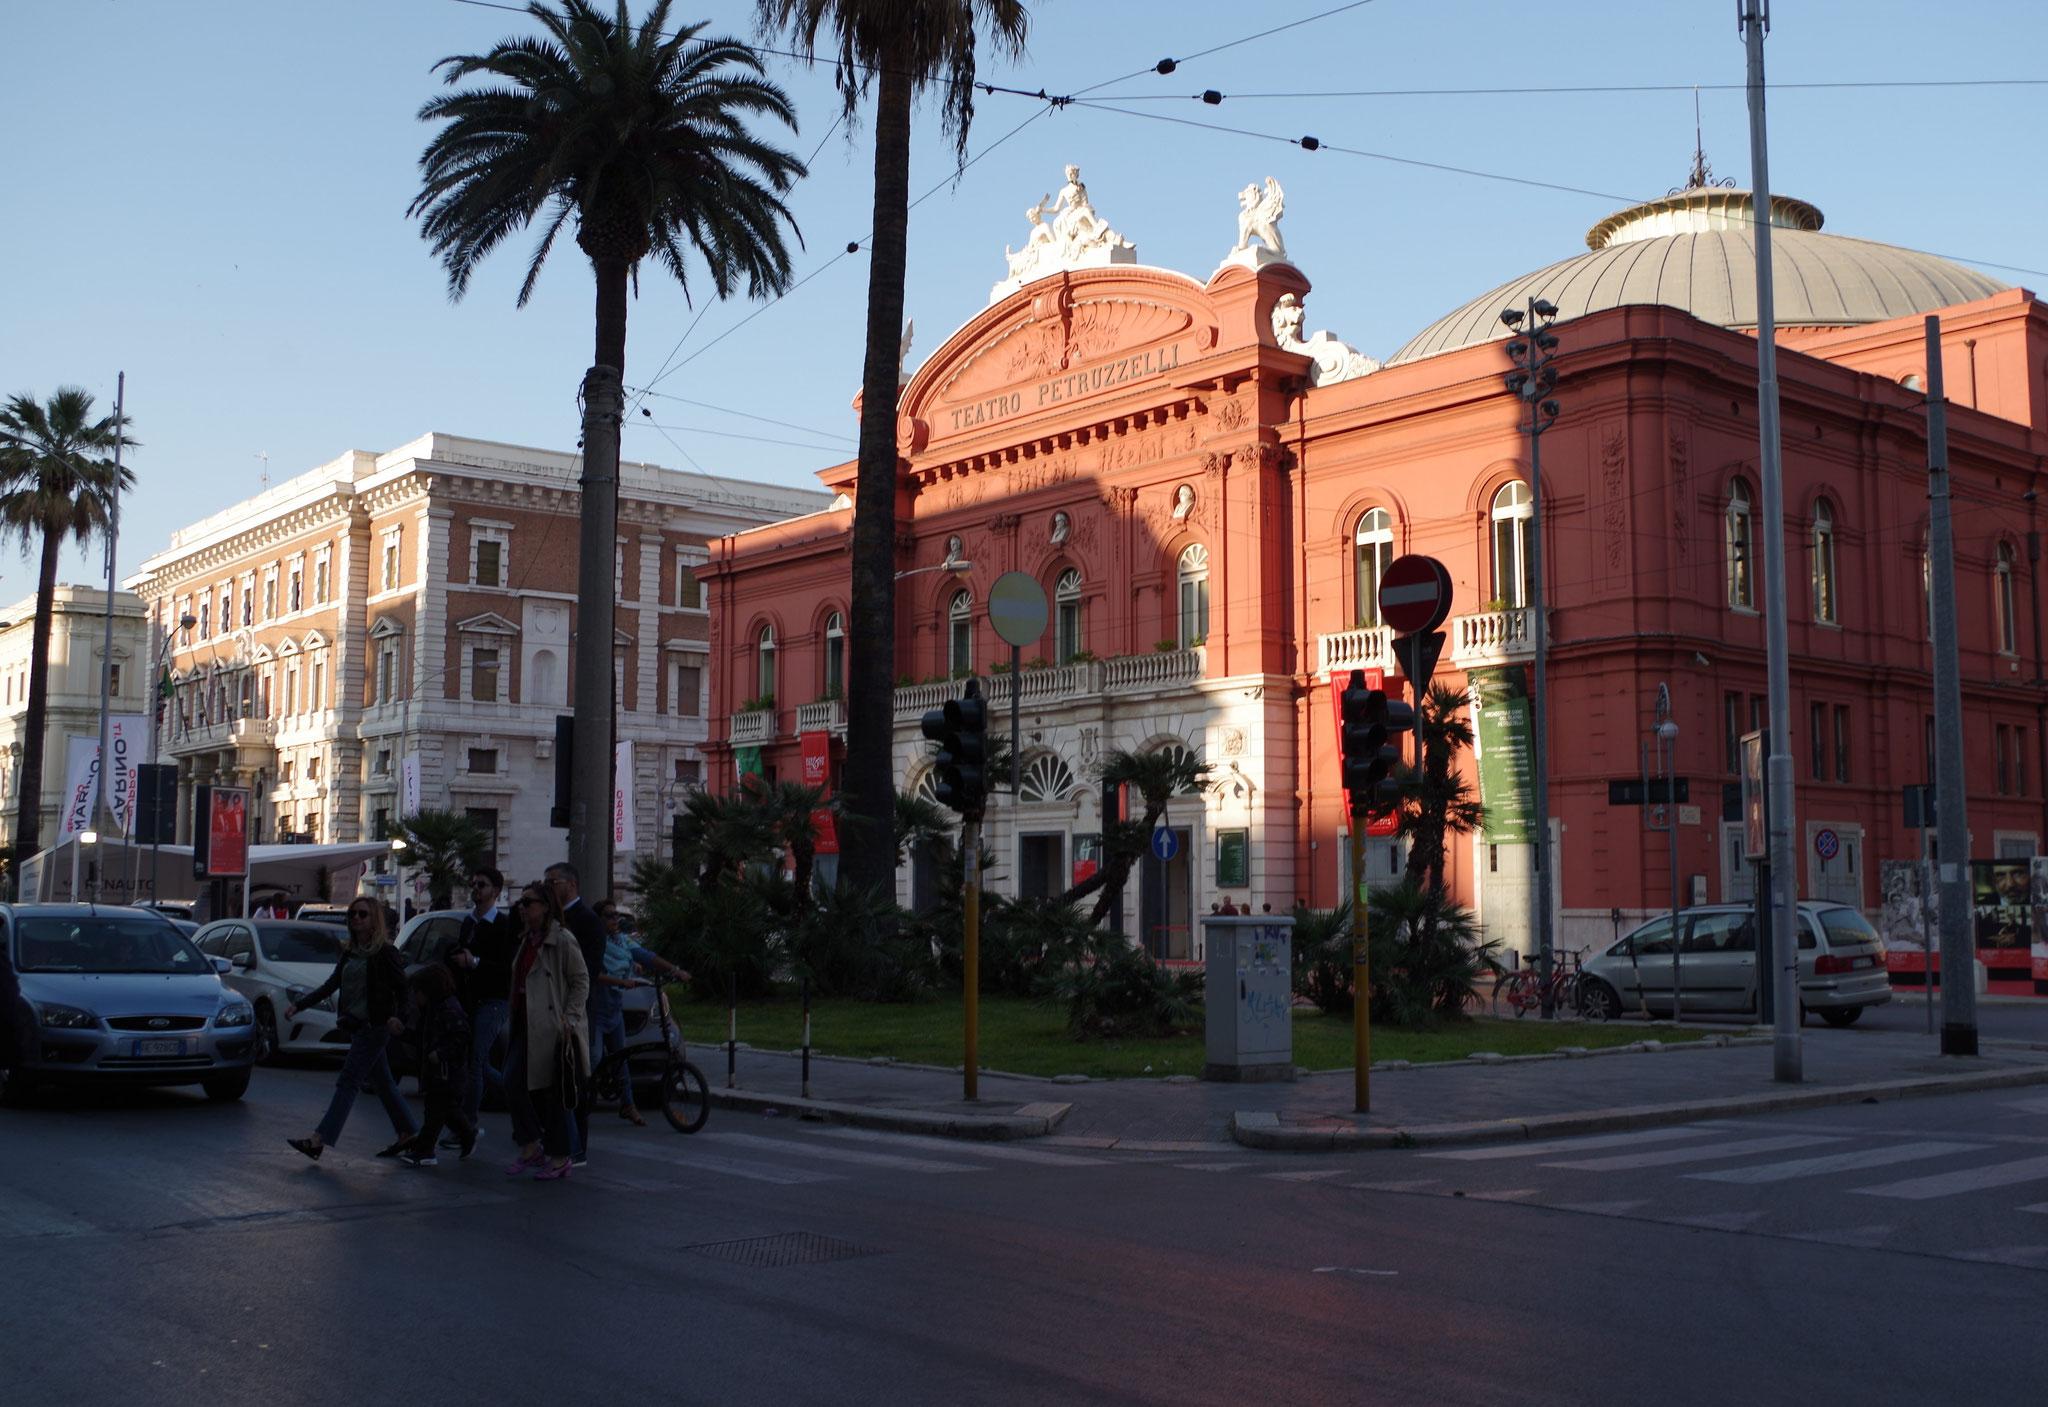 Teatro Petruzelli, Bari